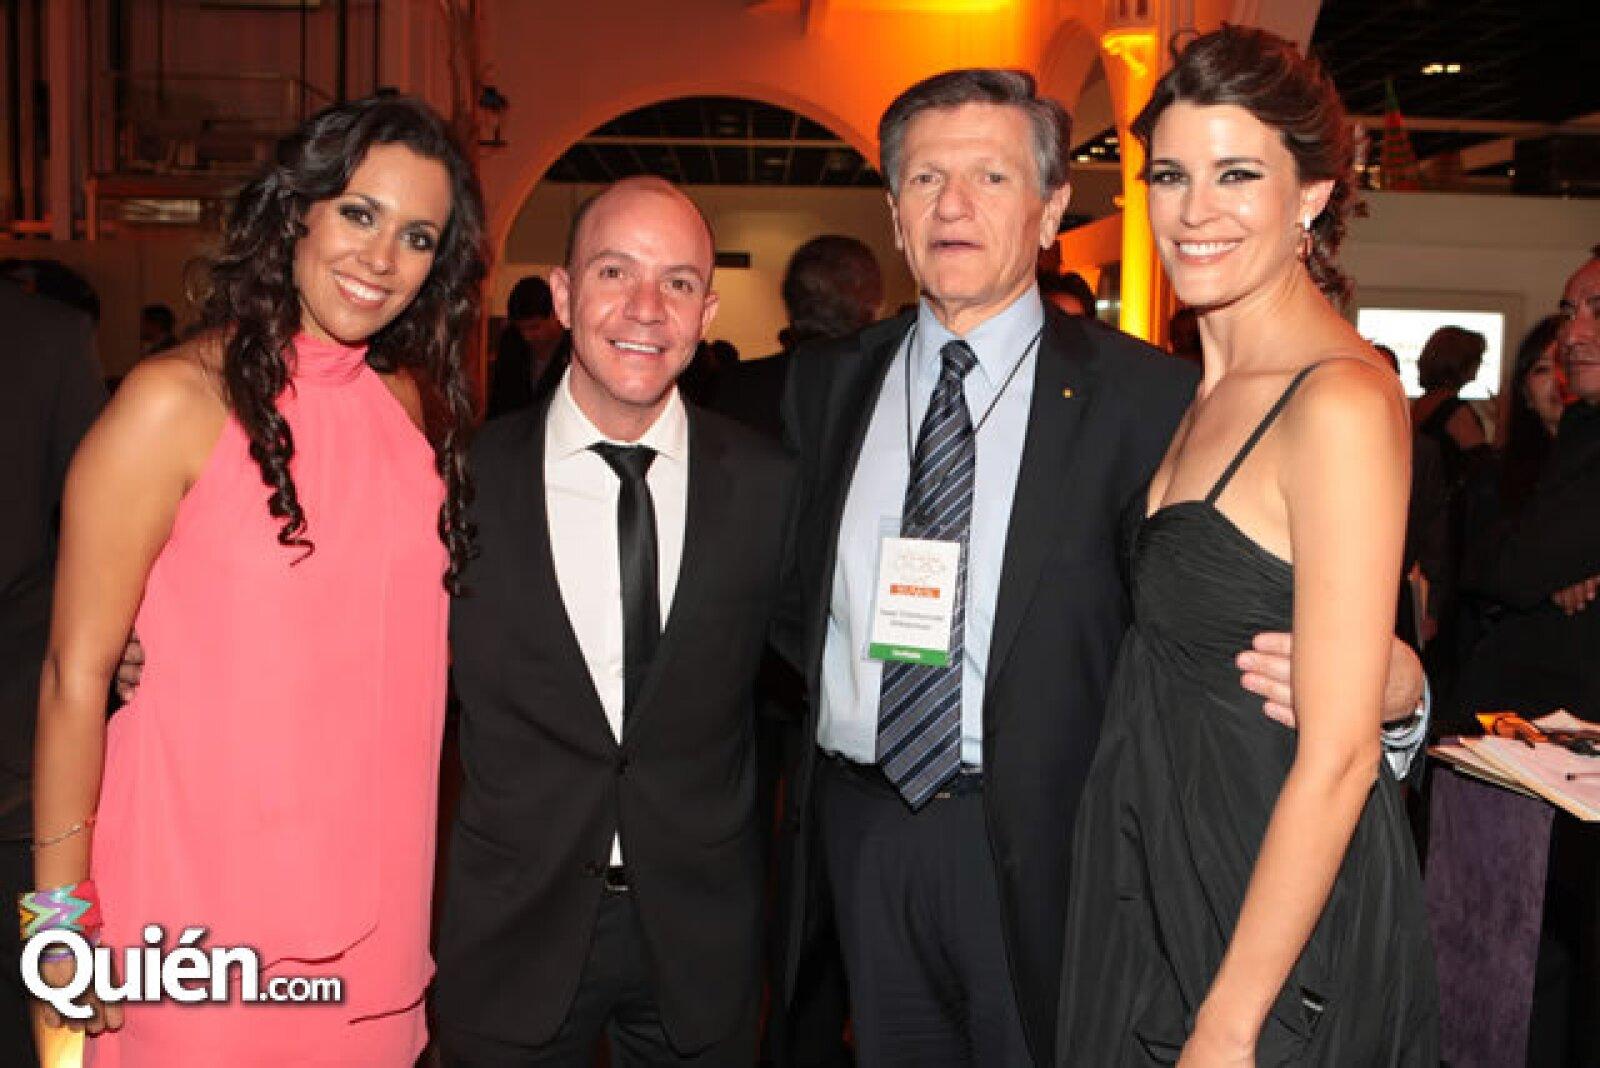 Melissa Vargas, Manolo Ablanedo, Isaac Chertorivski y Fabiola Torres